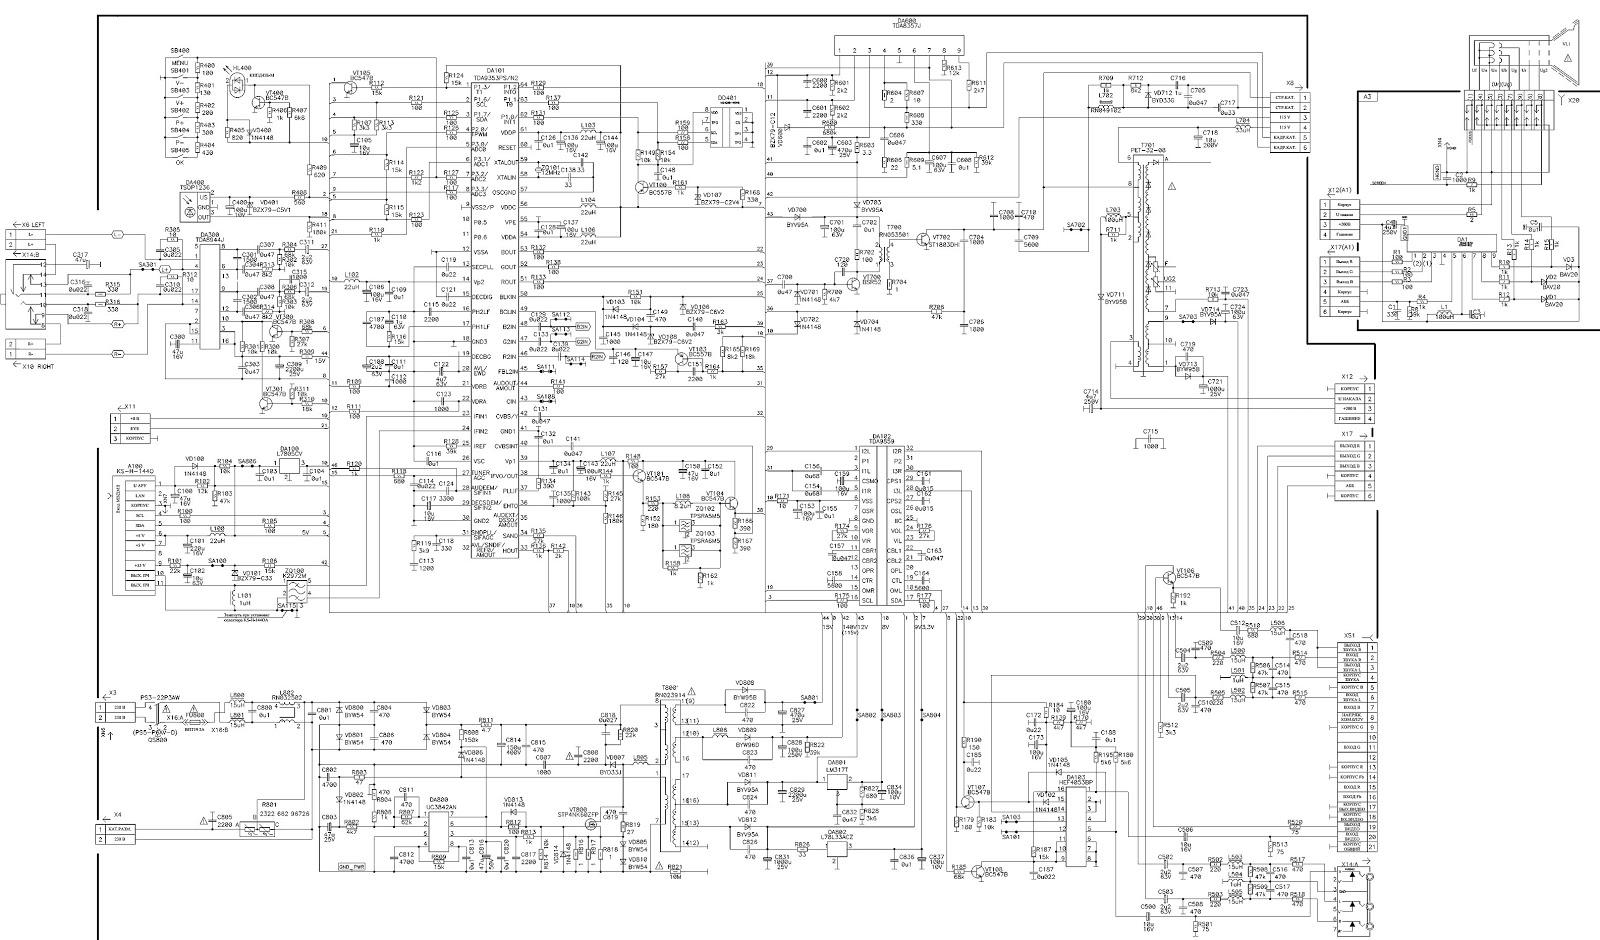 rolsen c2131 crt tv circuit diagram stp4nk60zfp. Black Bedroom Furniture Sets. Home Design Ideas